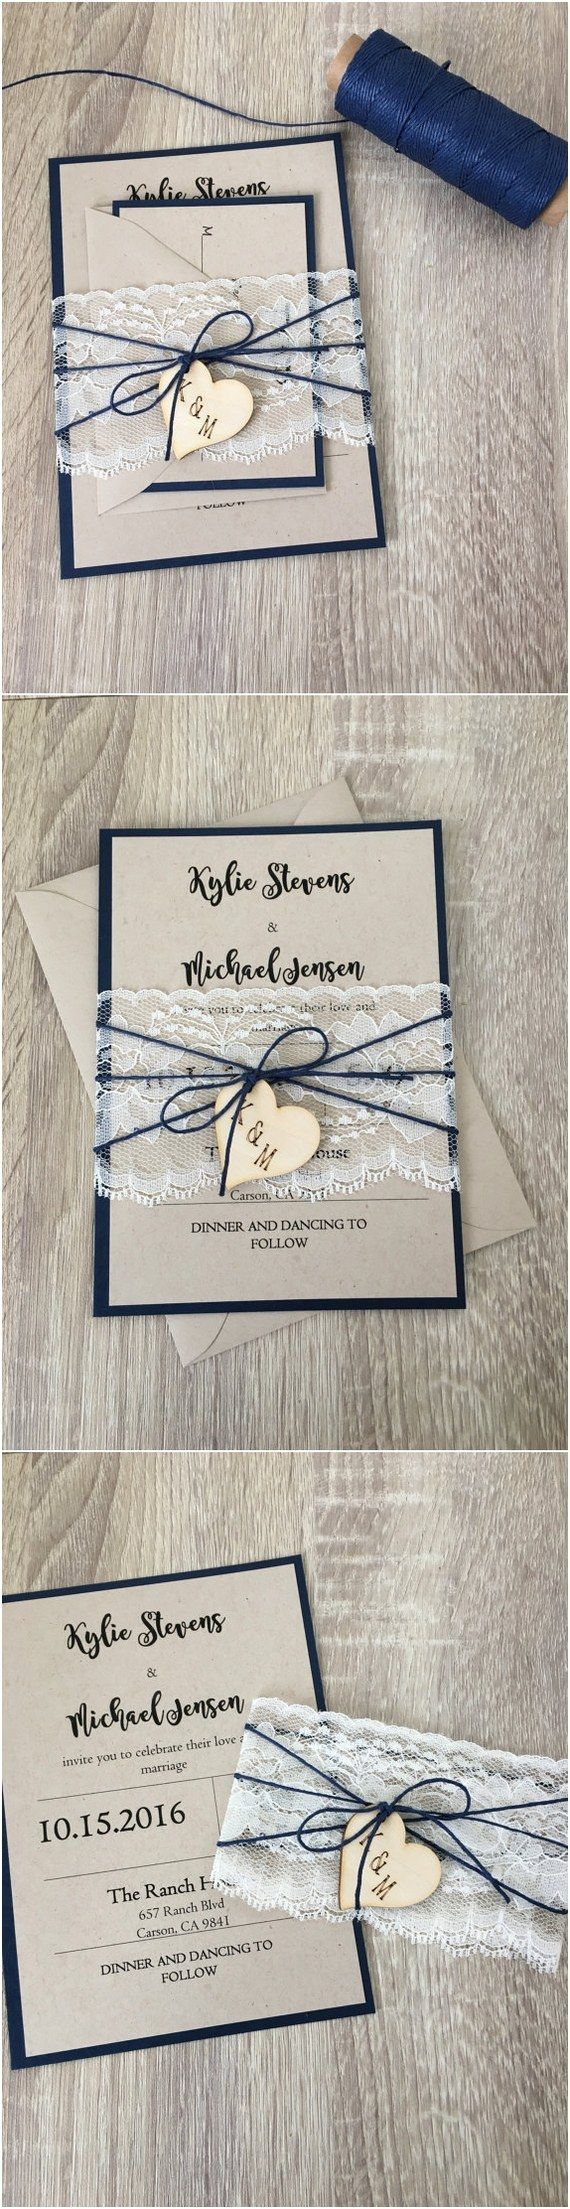 109 Best Diy Wedding Invitation Id Images On Pinterest Weddings